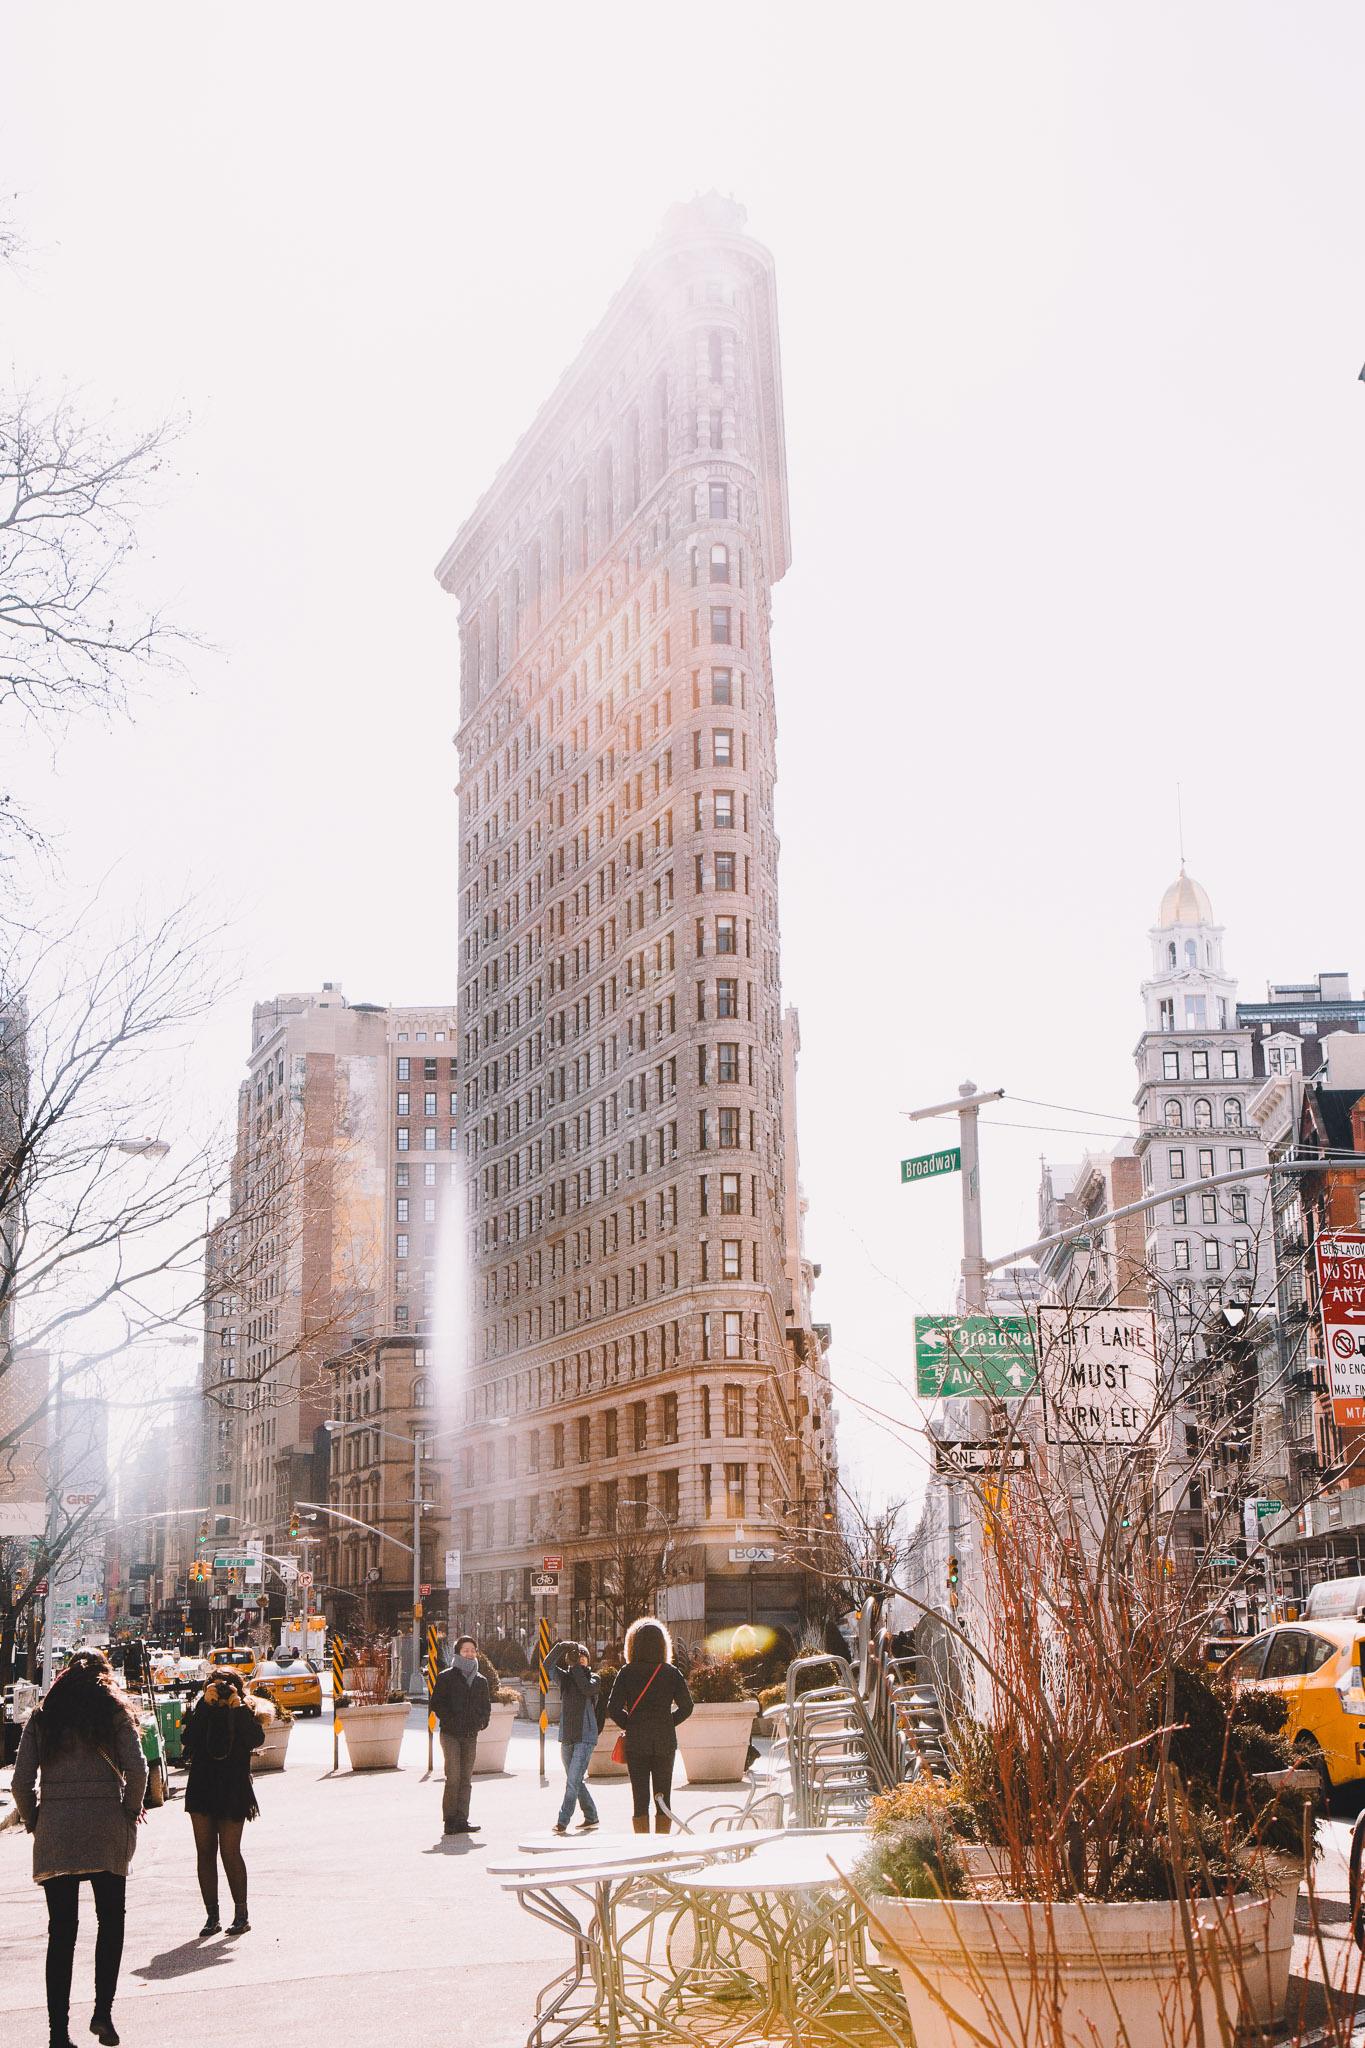 america-new-york-city-flat-iron.jpg